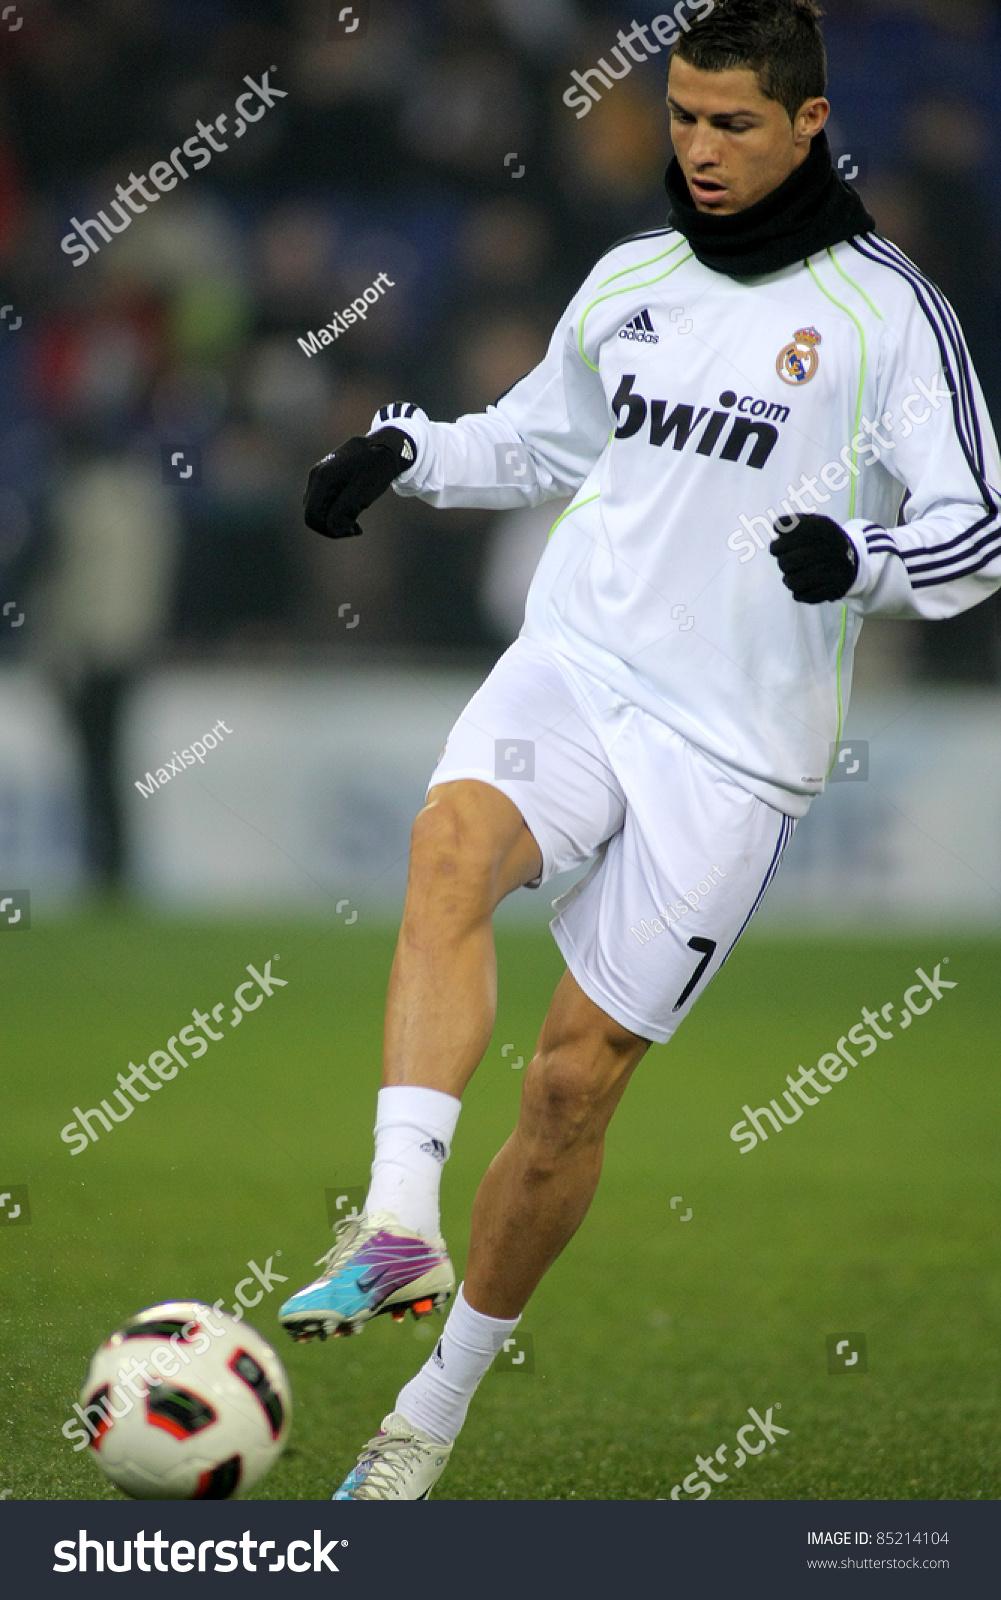 f6fdb2af8 BARCELONA - FEB 13  Cristiano Ronaldo of Real Madrid before a spanish  league match between Espanyol and Real Madrid at the Estadi Cornella on  February 13